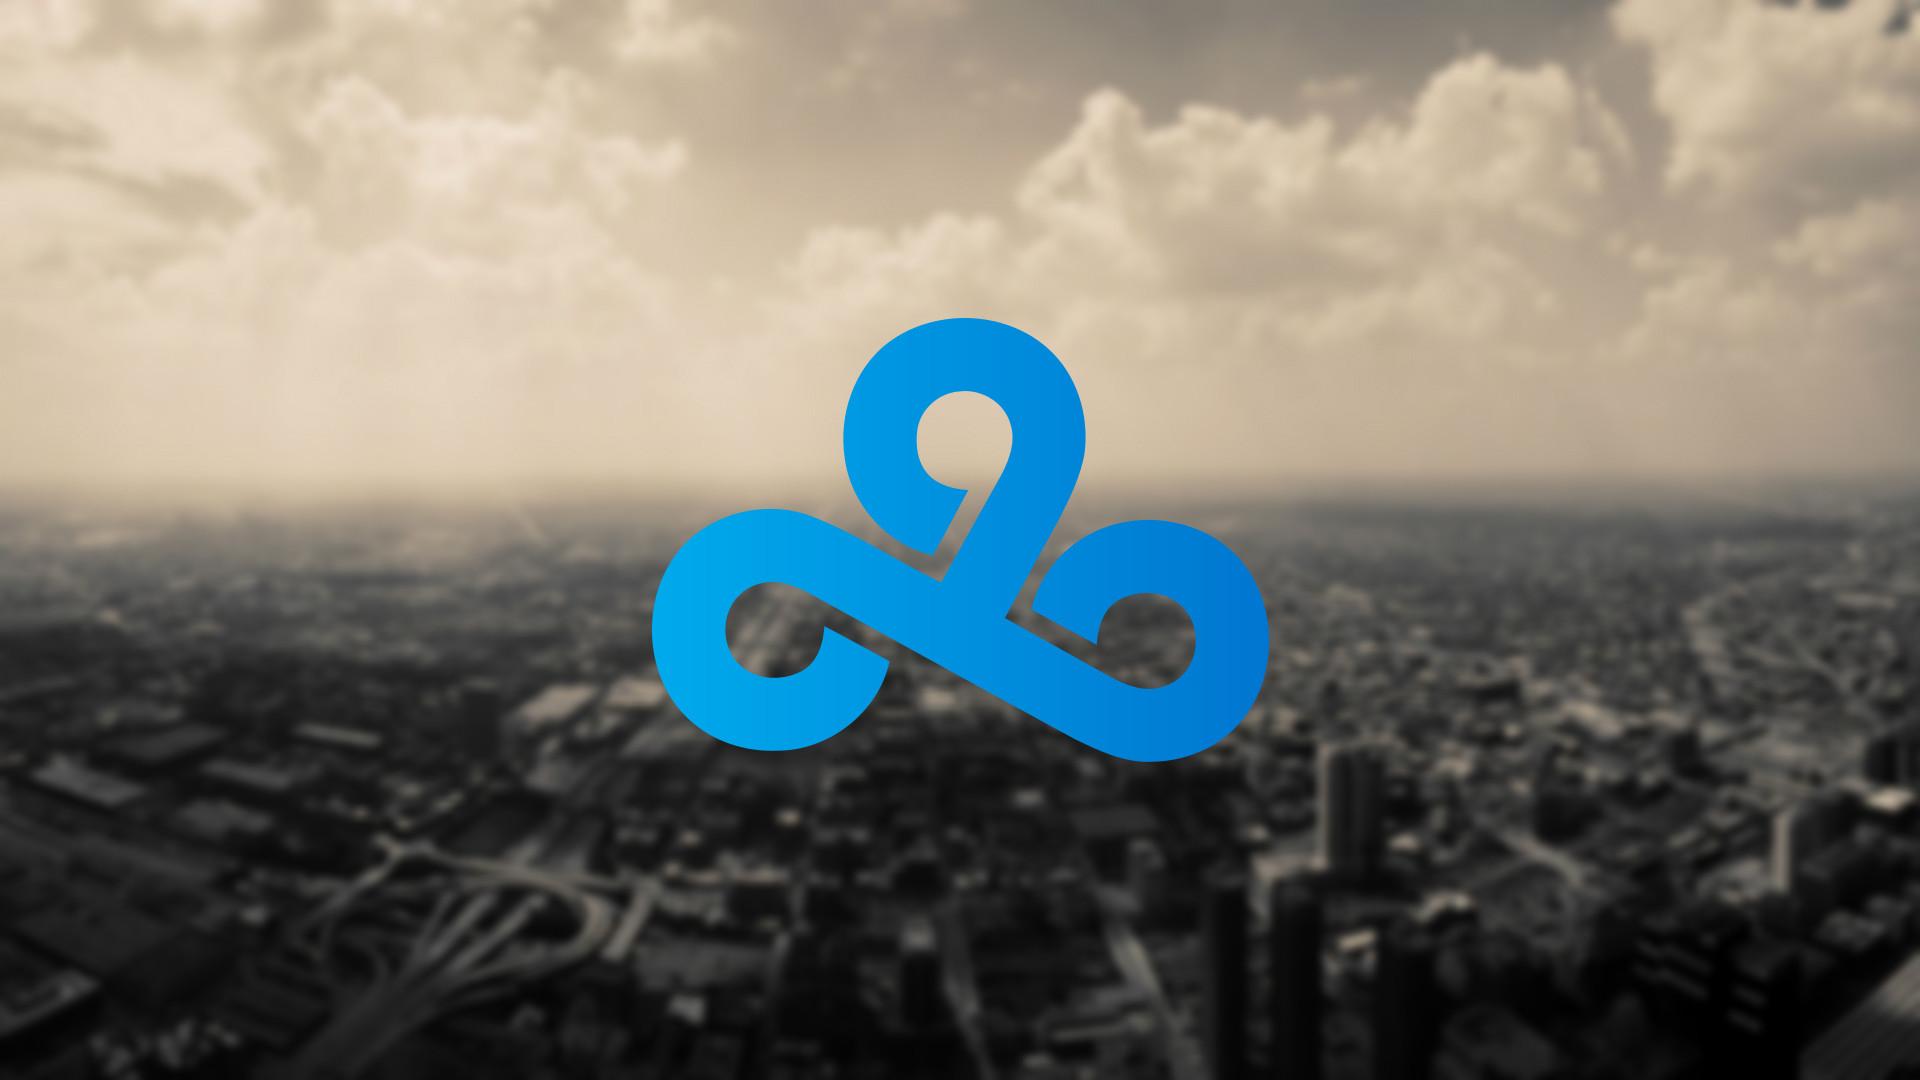 Cloud9 Los Angeles Cloud9 Fade